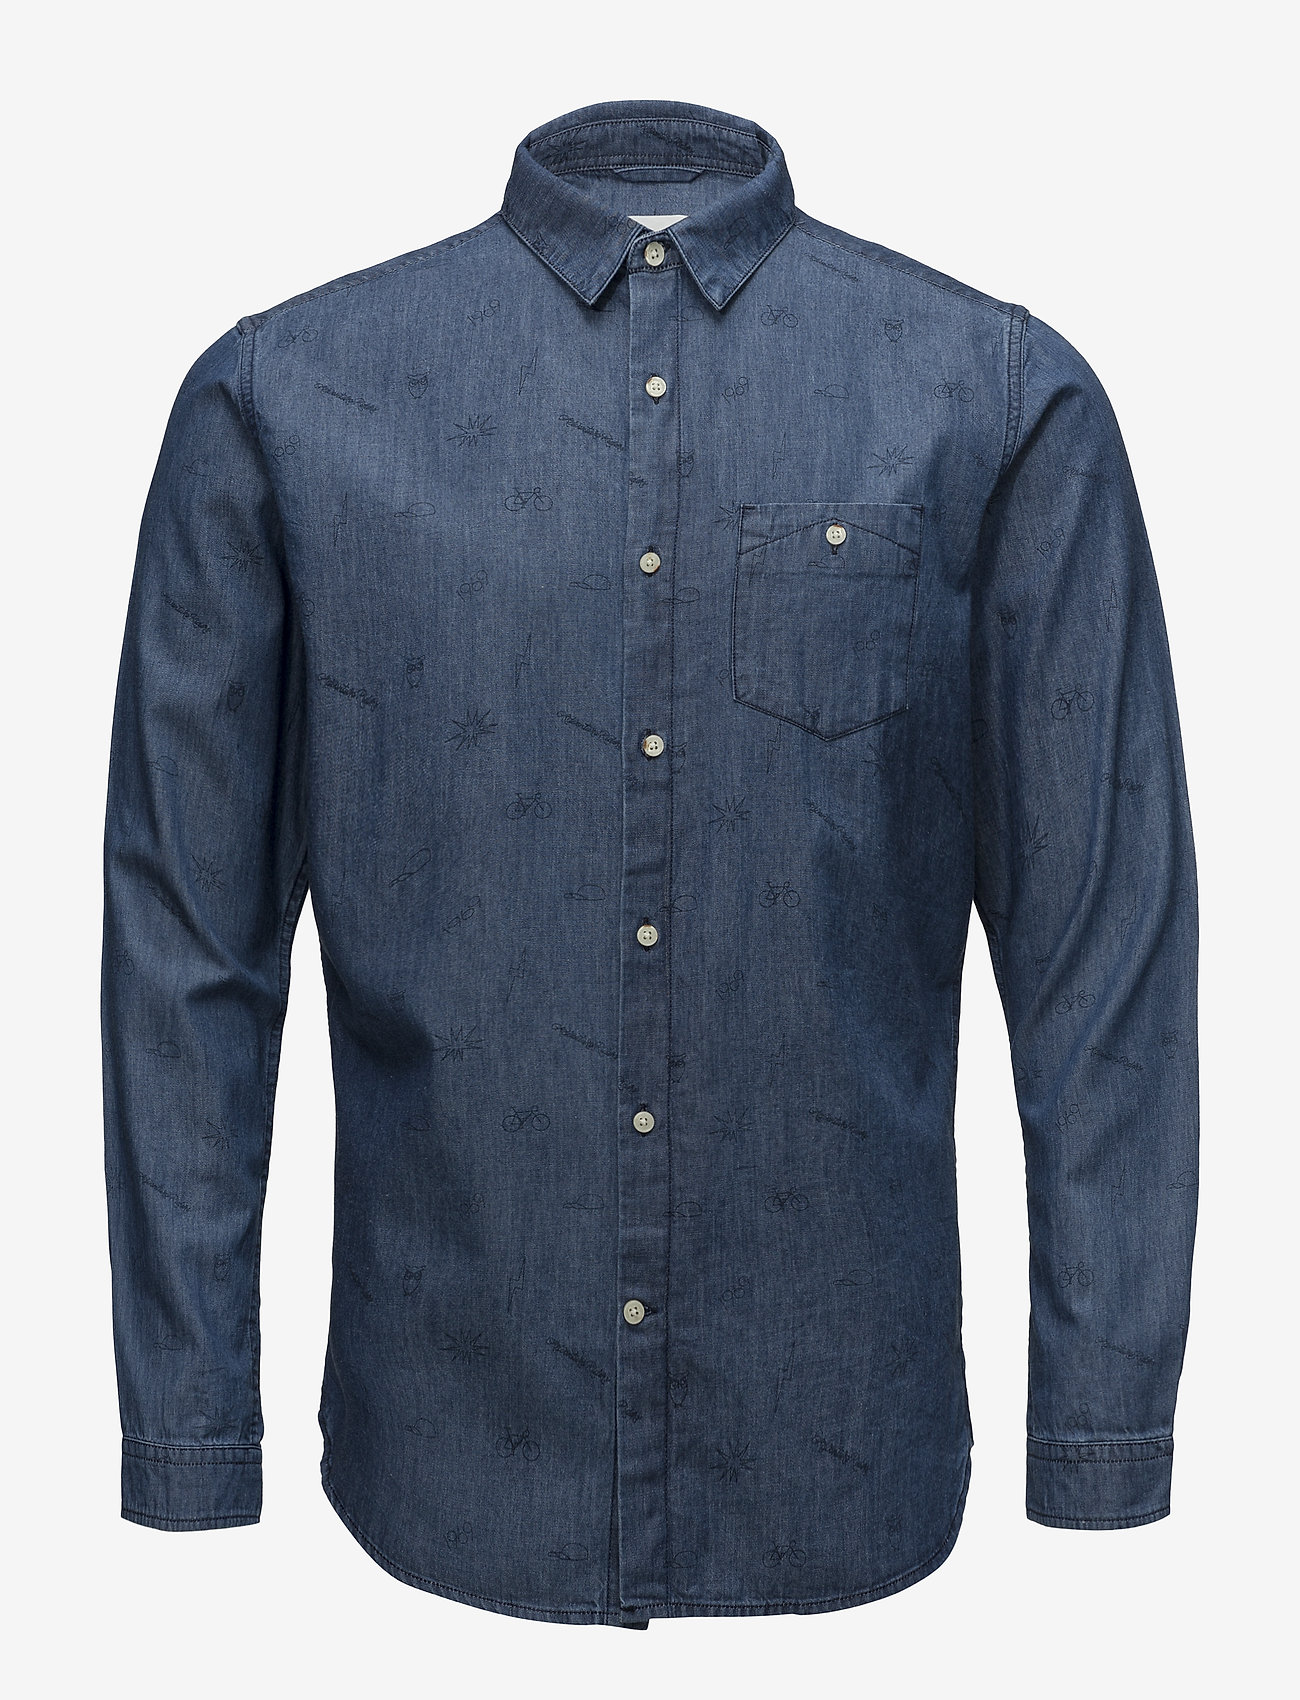 Knowledge Cotton Apparel - Denim shirt with concept print - GO - denim shirts - deep sea